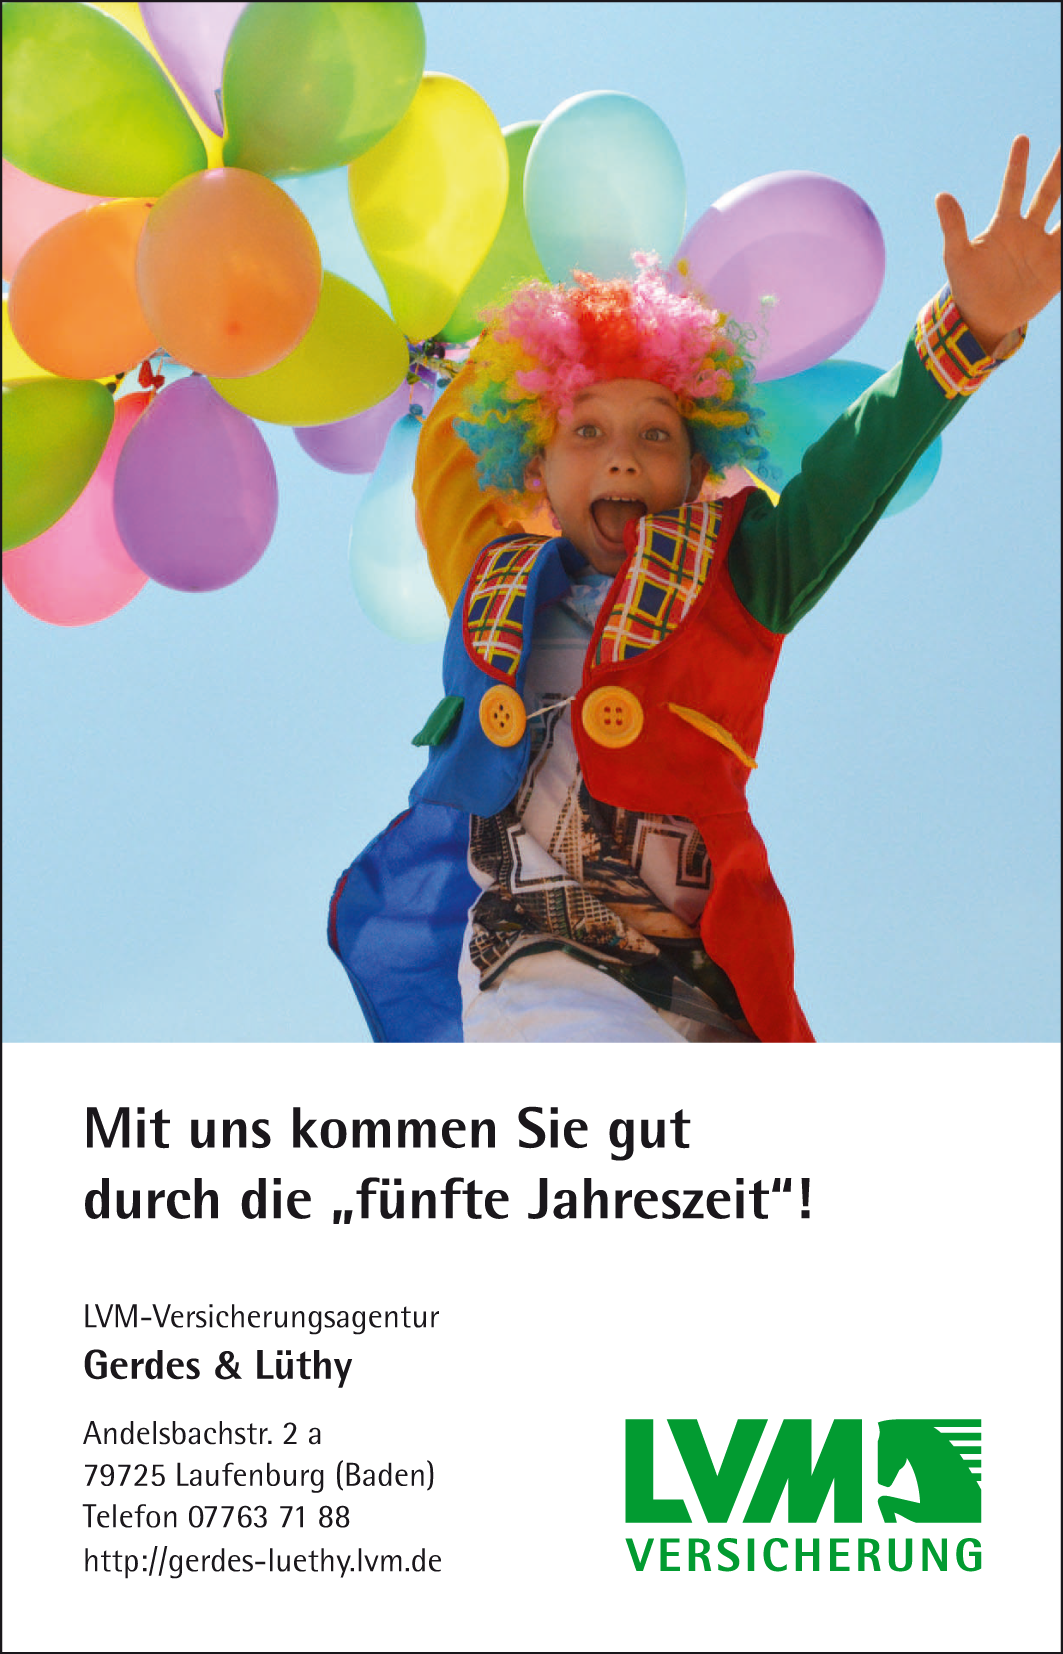 Sponsoring-LVM-Gerdes_LÅthy-Motiv-_FÅnfte-Jahreszeit_